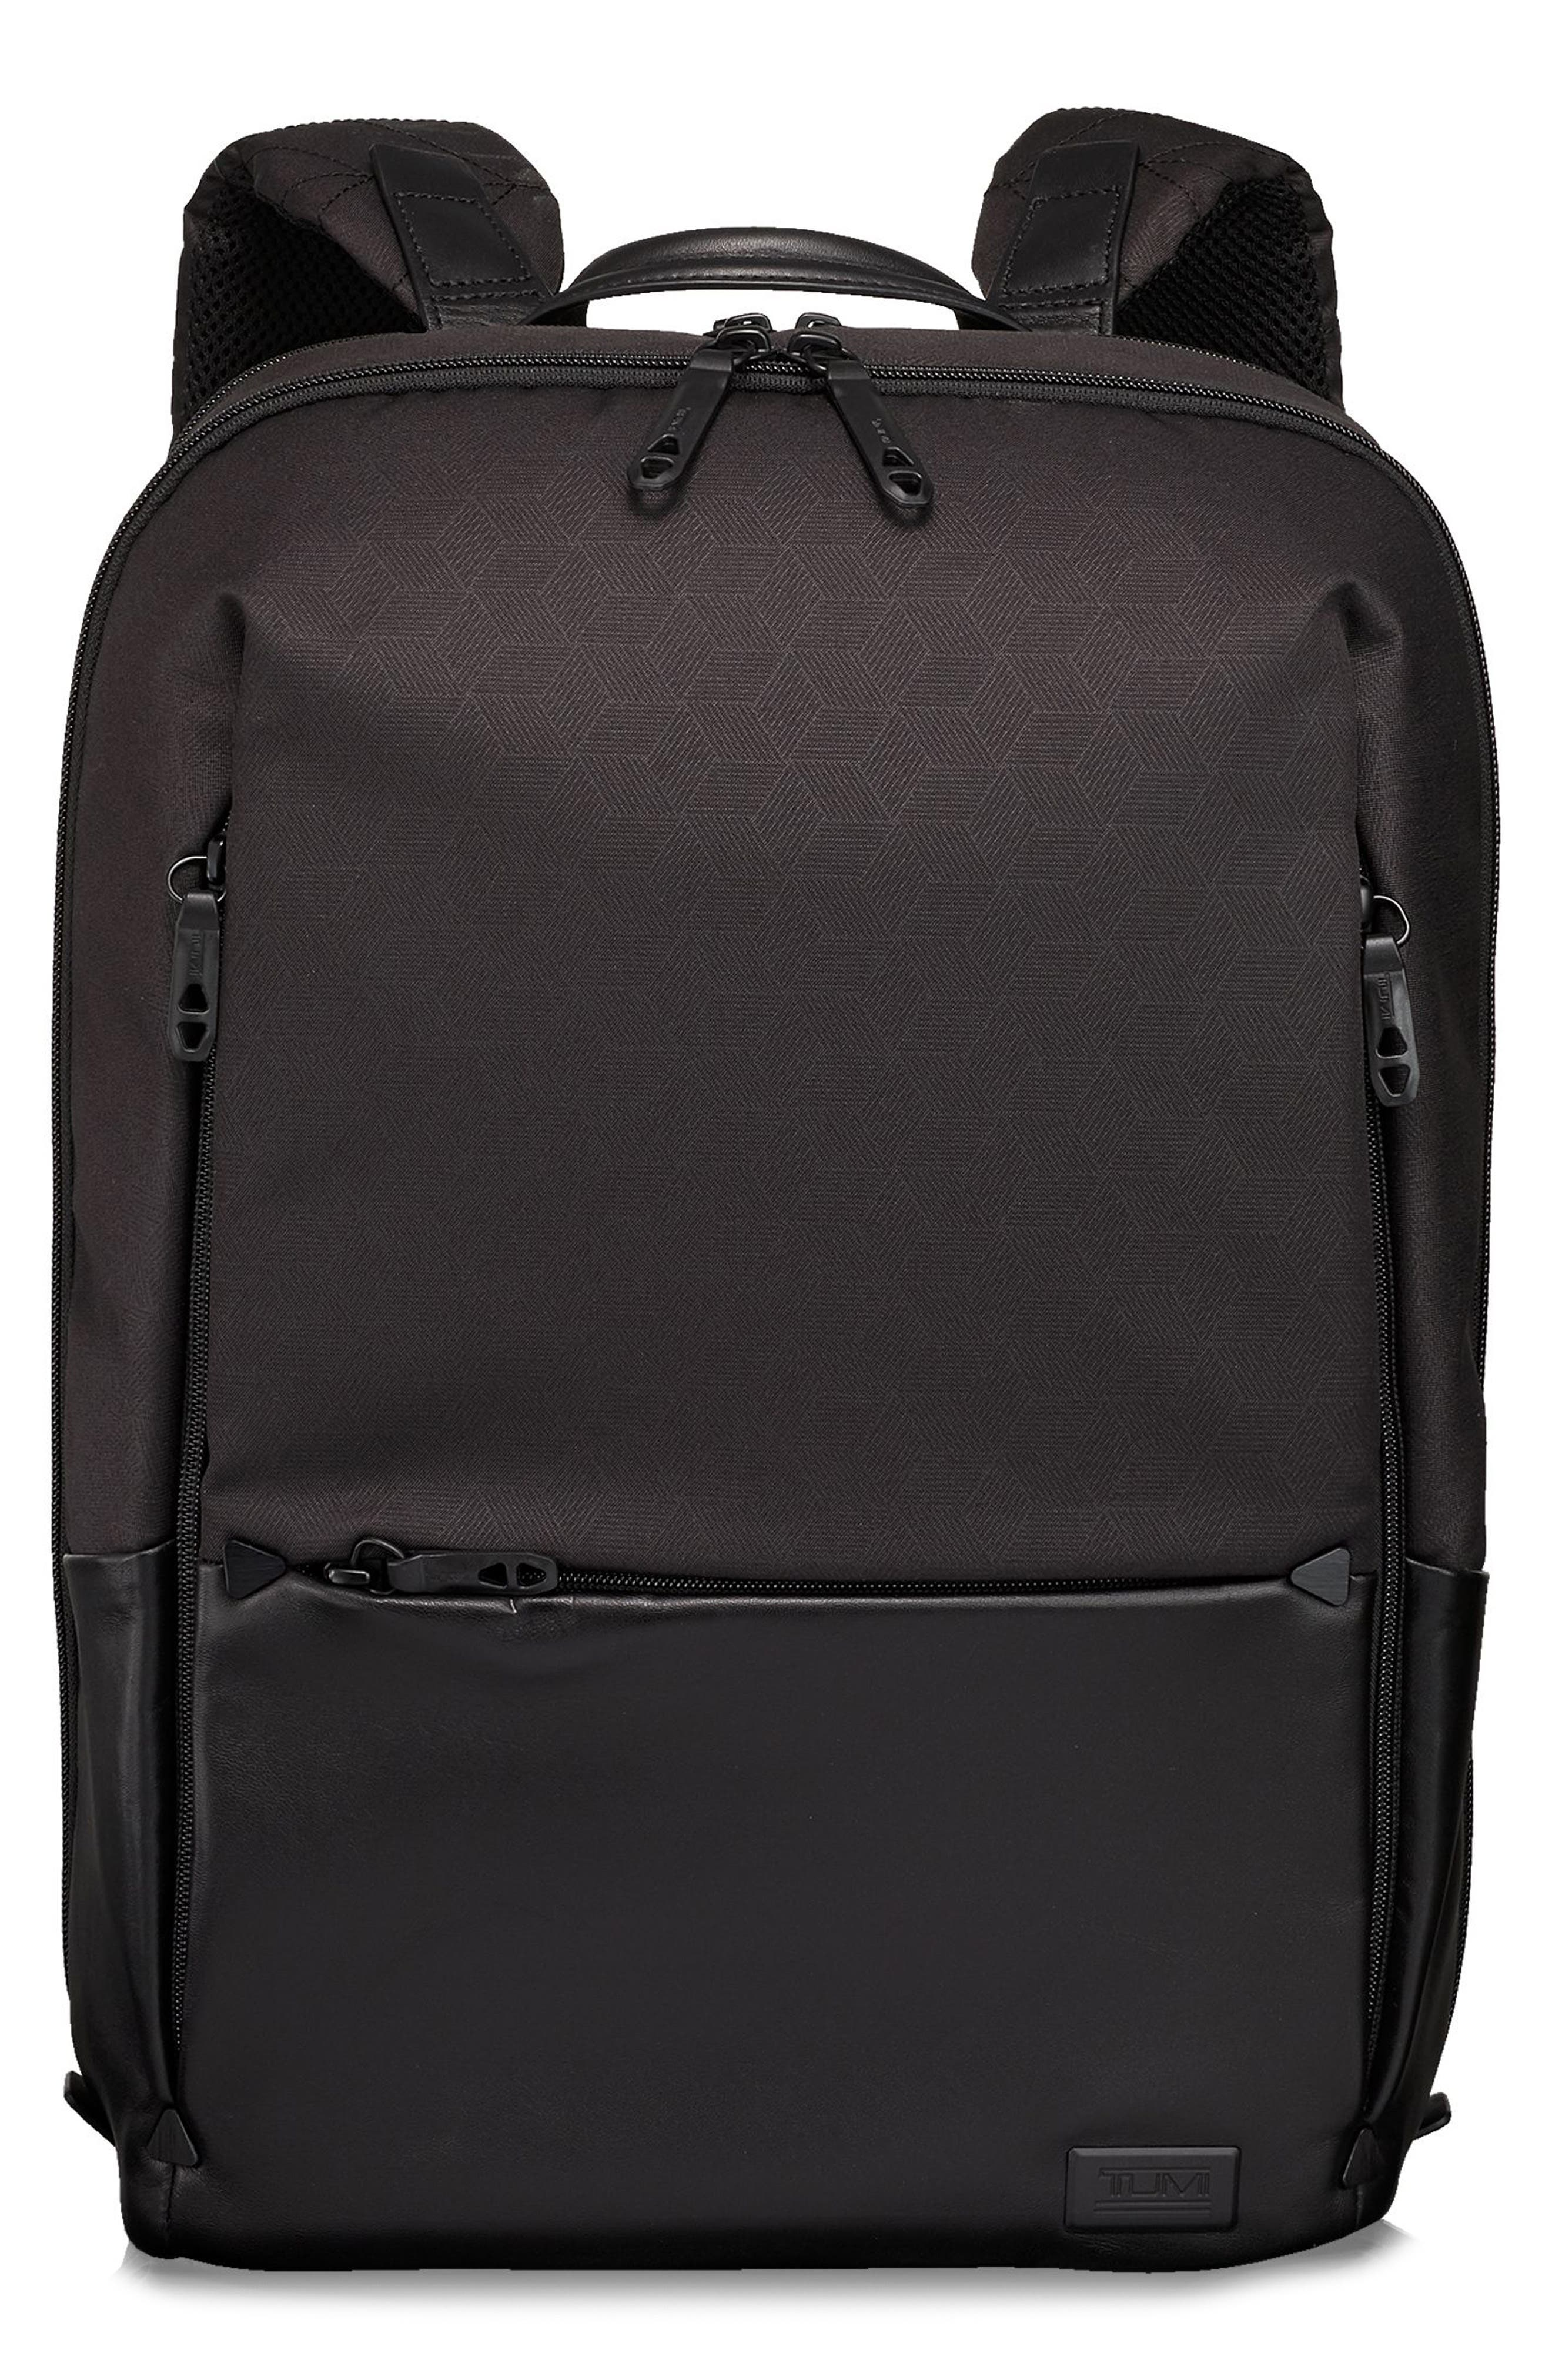 Butler Backpack,                             Main thumbnail 1, color,                             Black